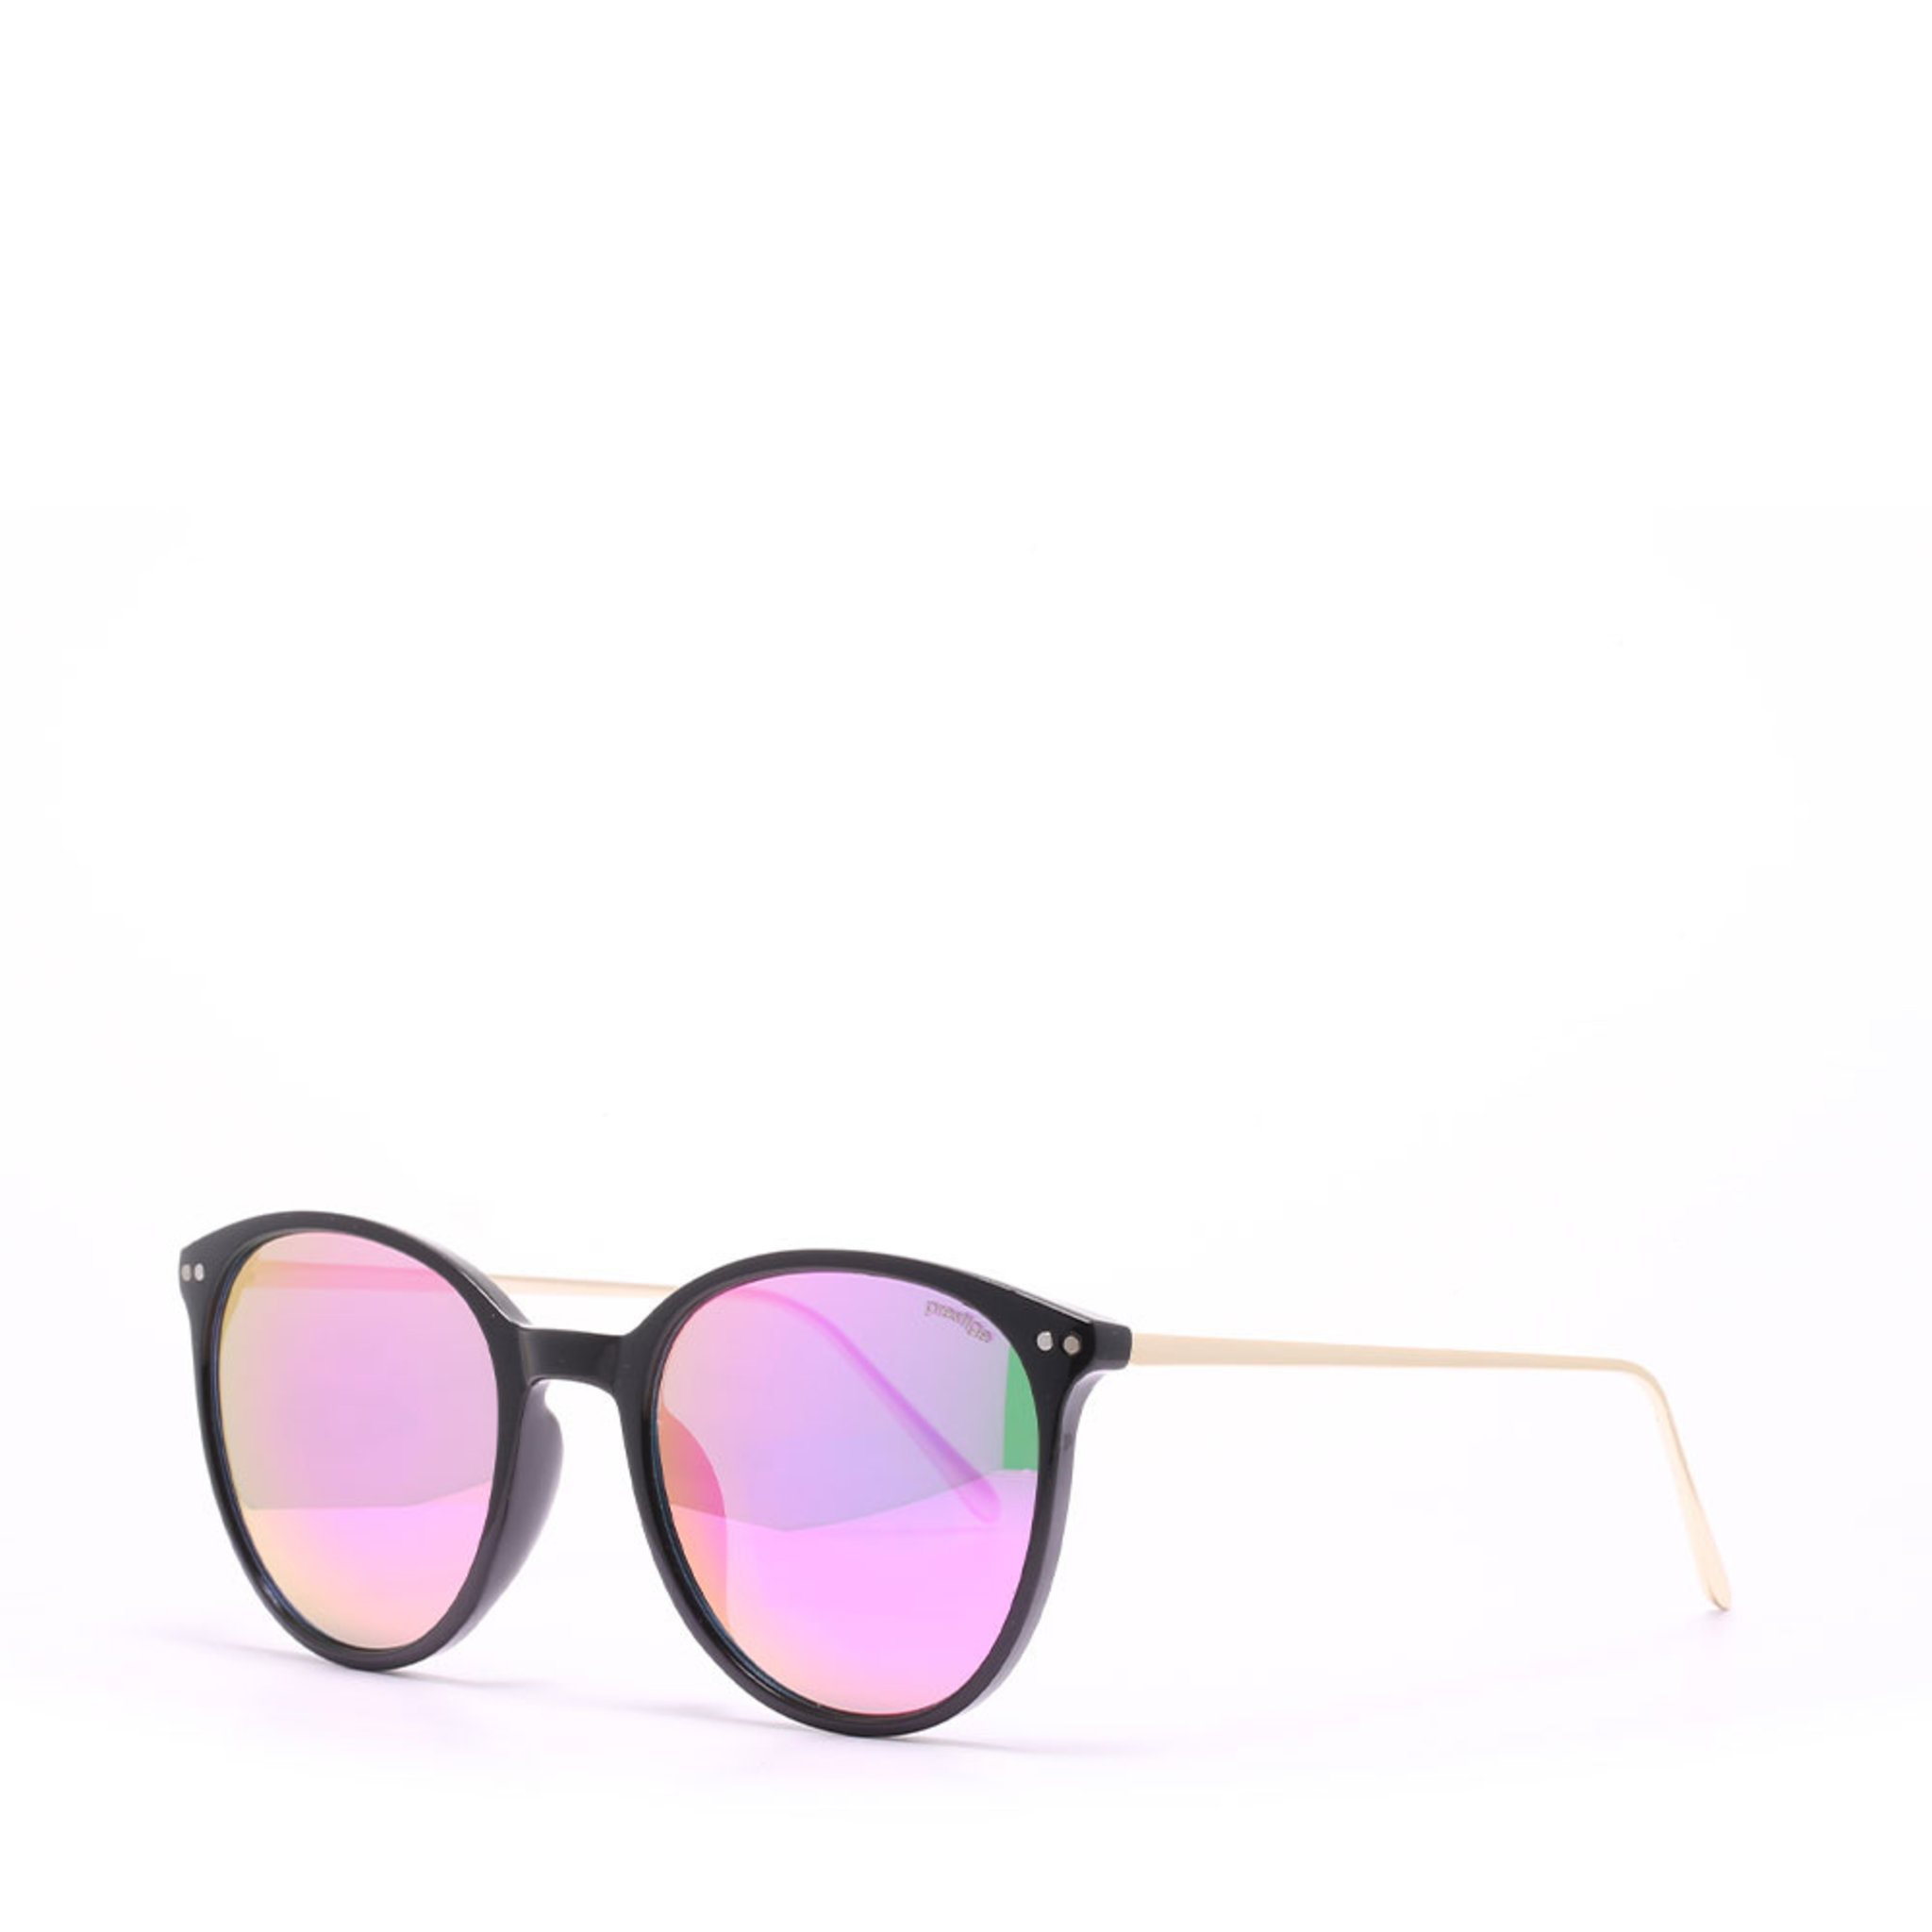 Wilma Black Sunglasses